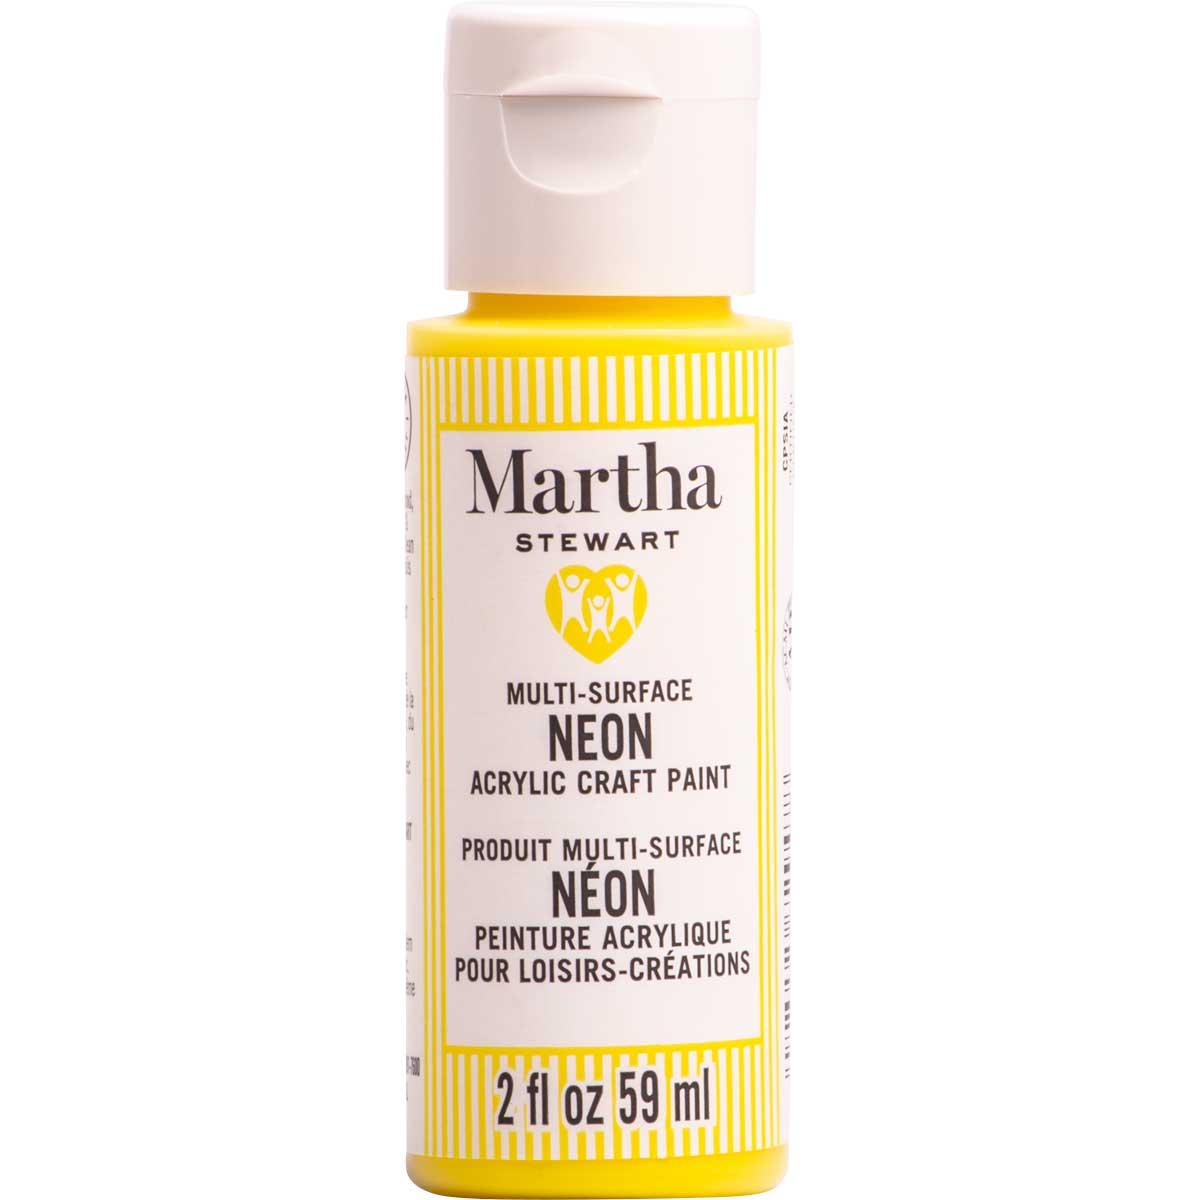 Martha Stewart ® Multi-Surface Neon Acrylic Craft Paint CPSIA - Pineapple Yellow, 2 oz. - 72947